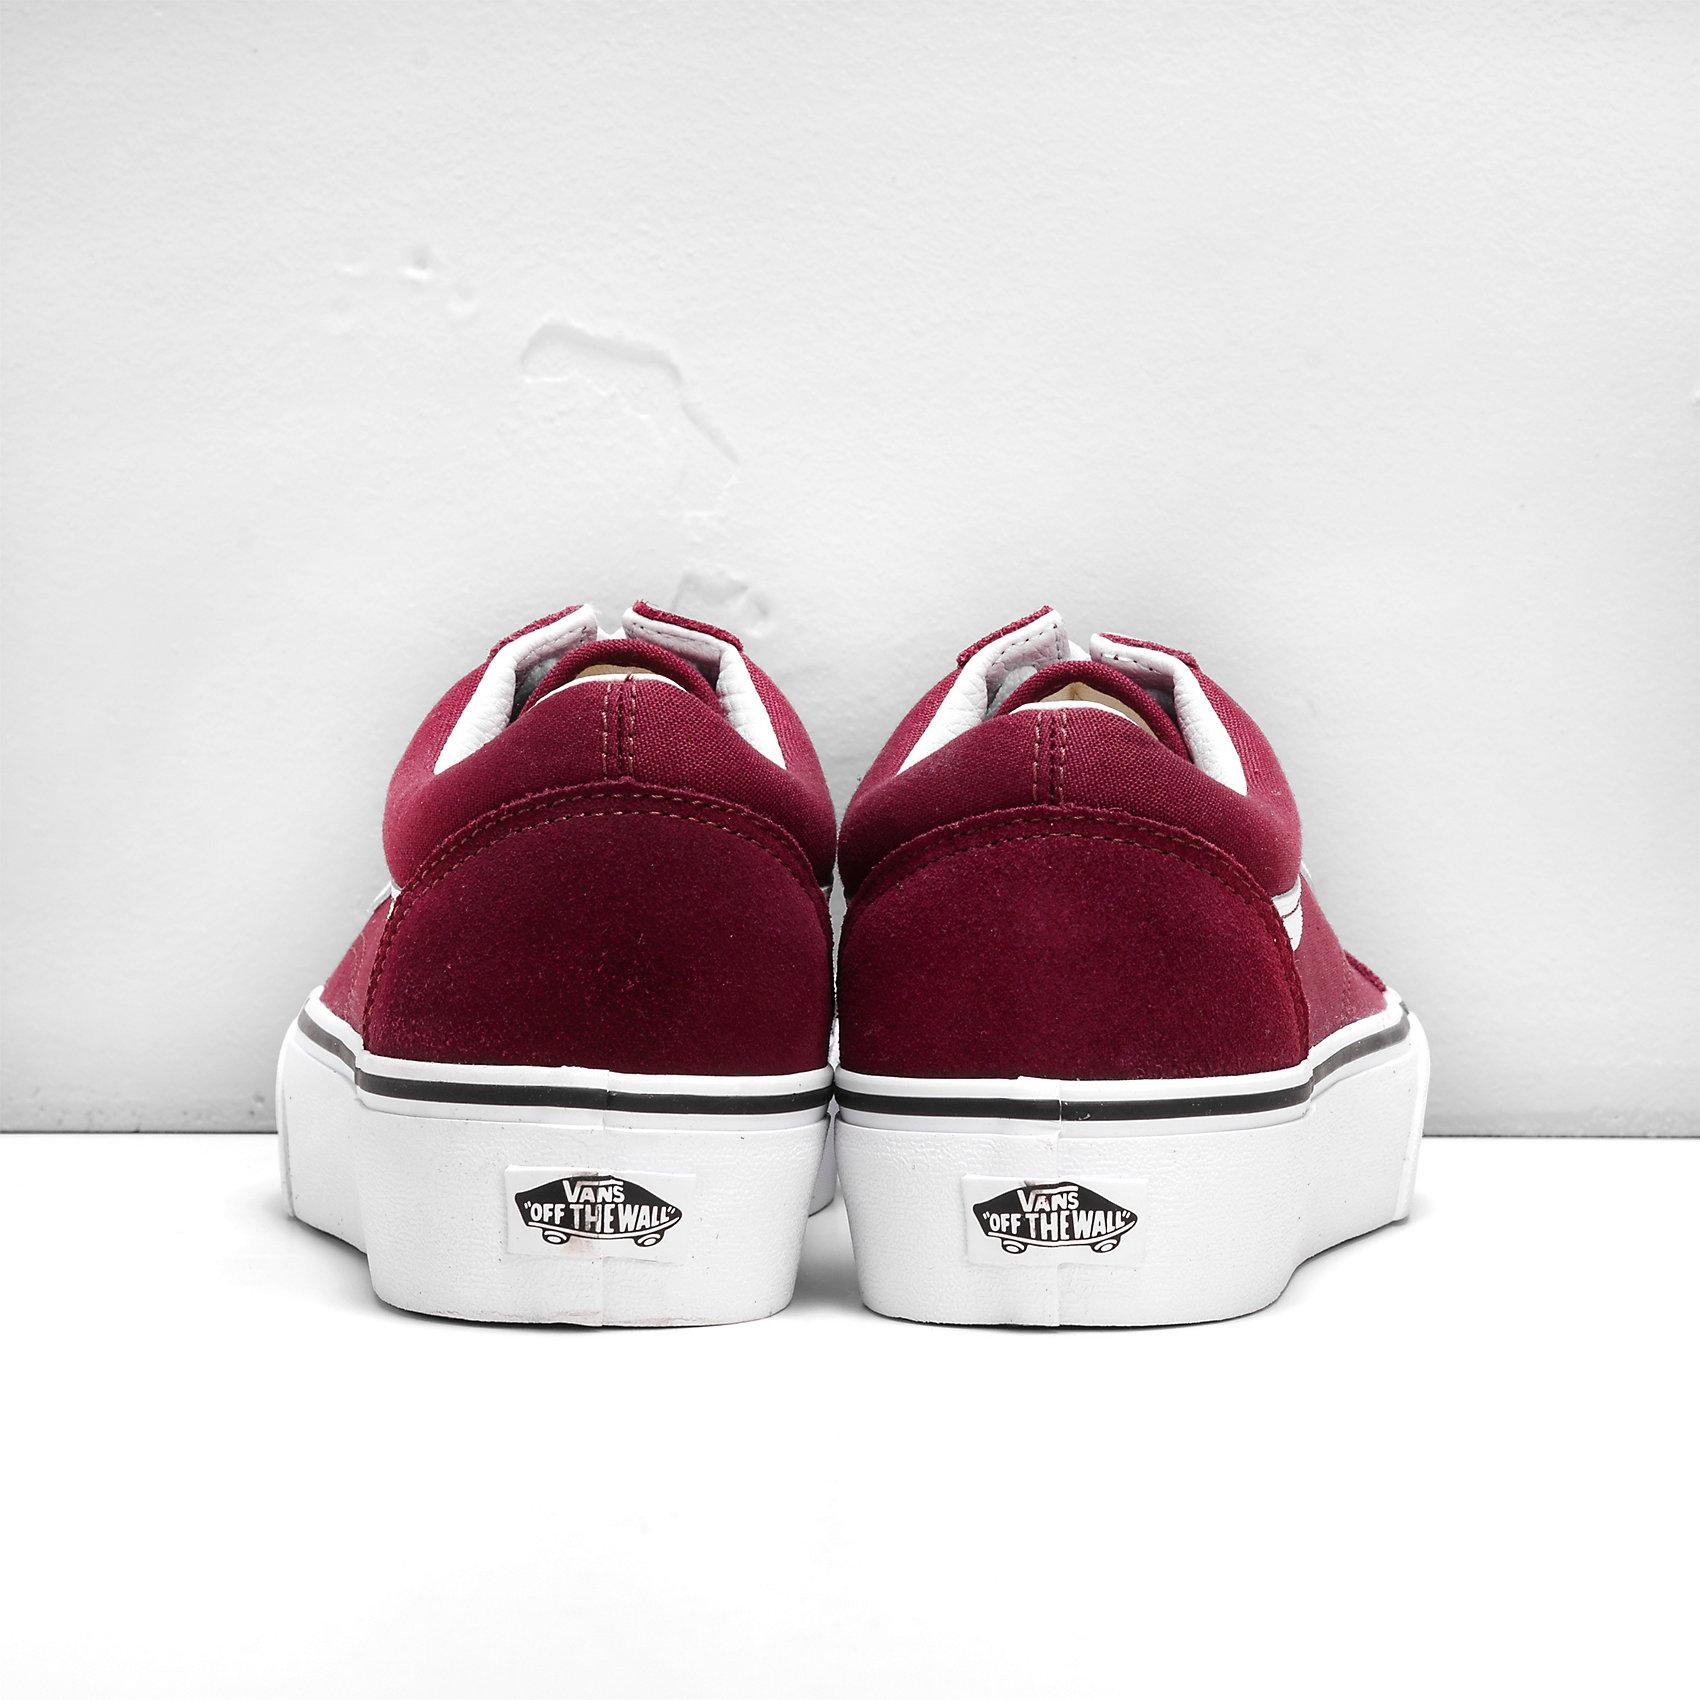 Neu VANS Old Skool Platform Platform Platform Sneakers bordeaux 6714317 2ea544